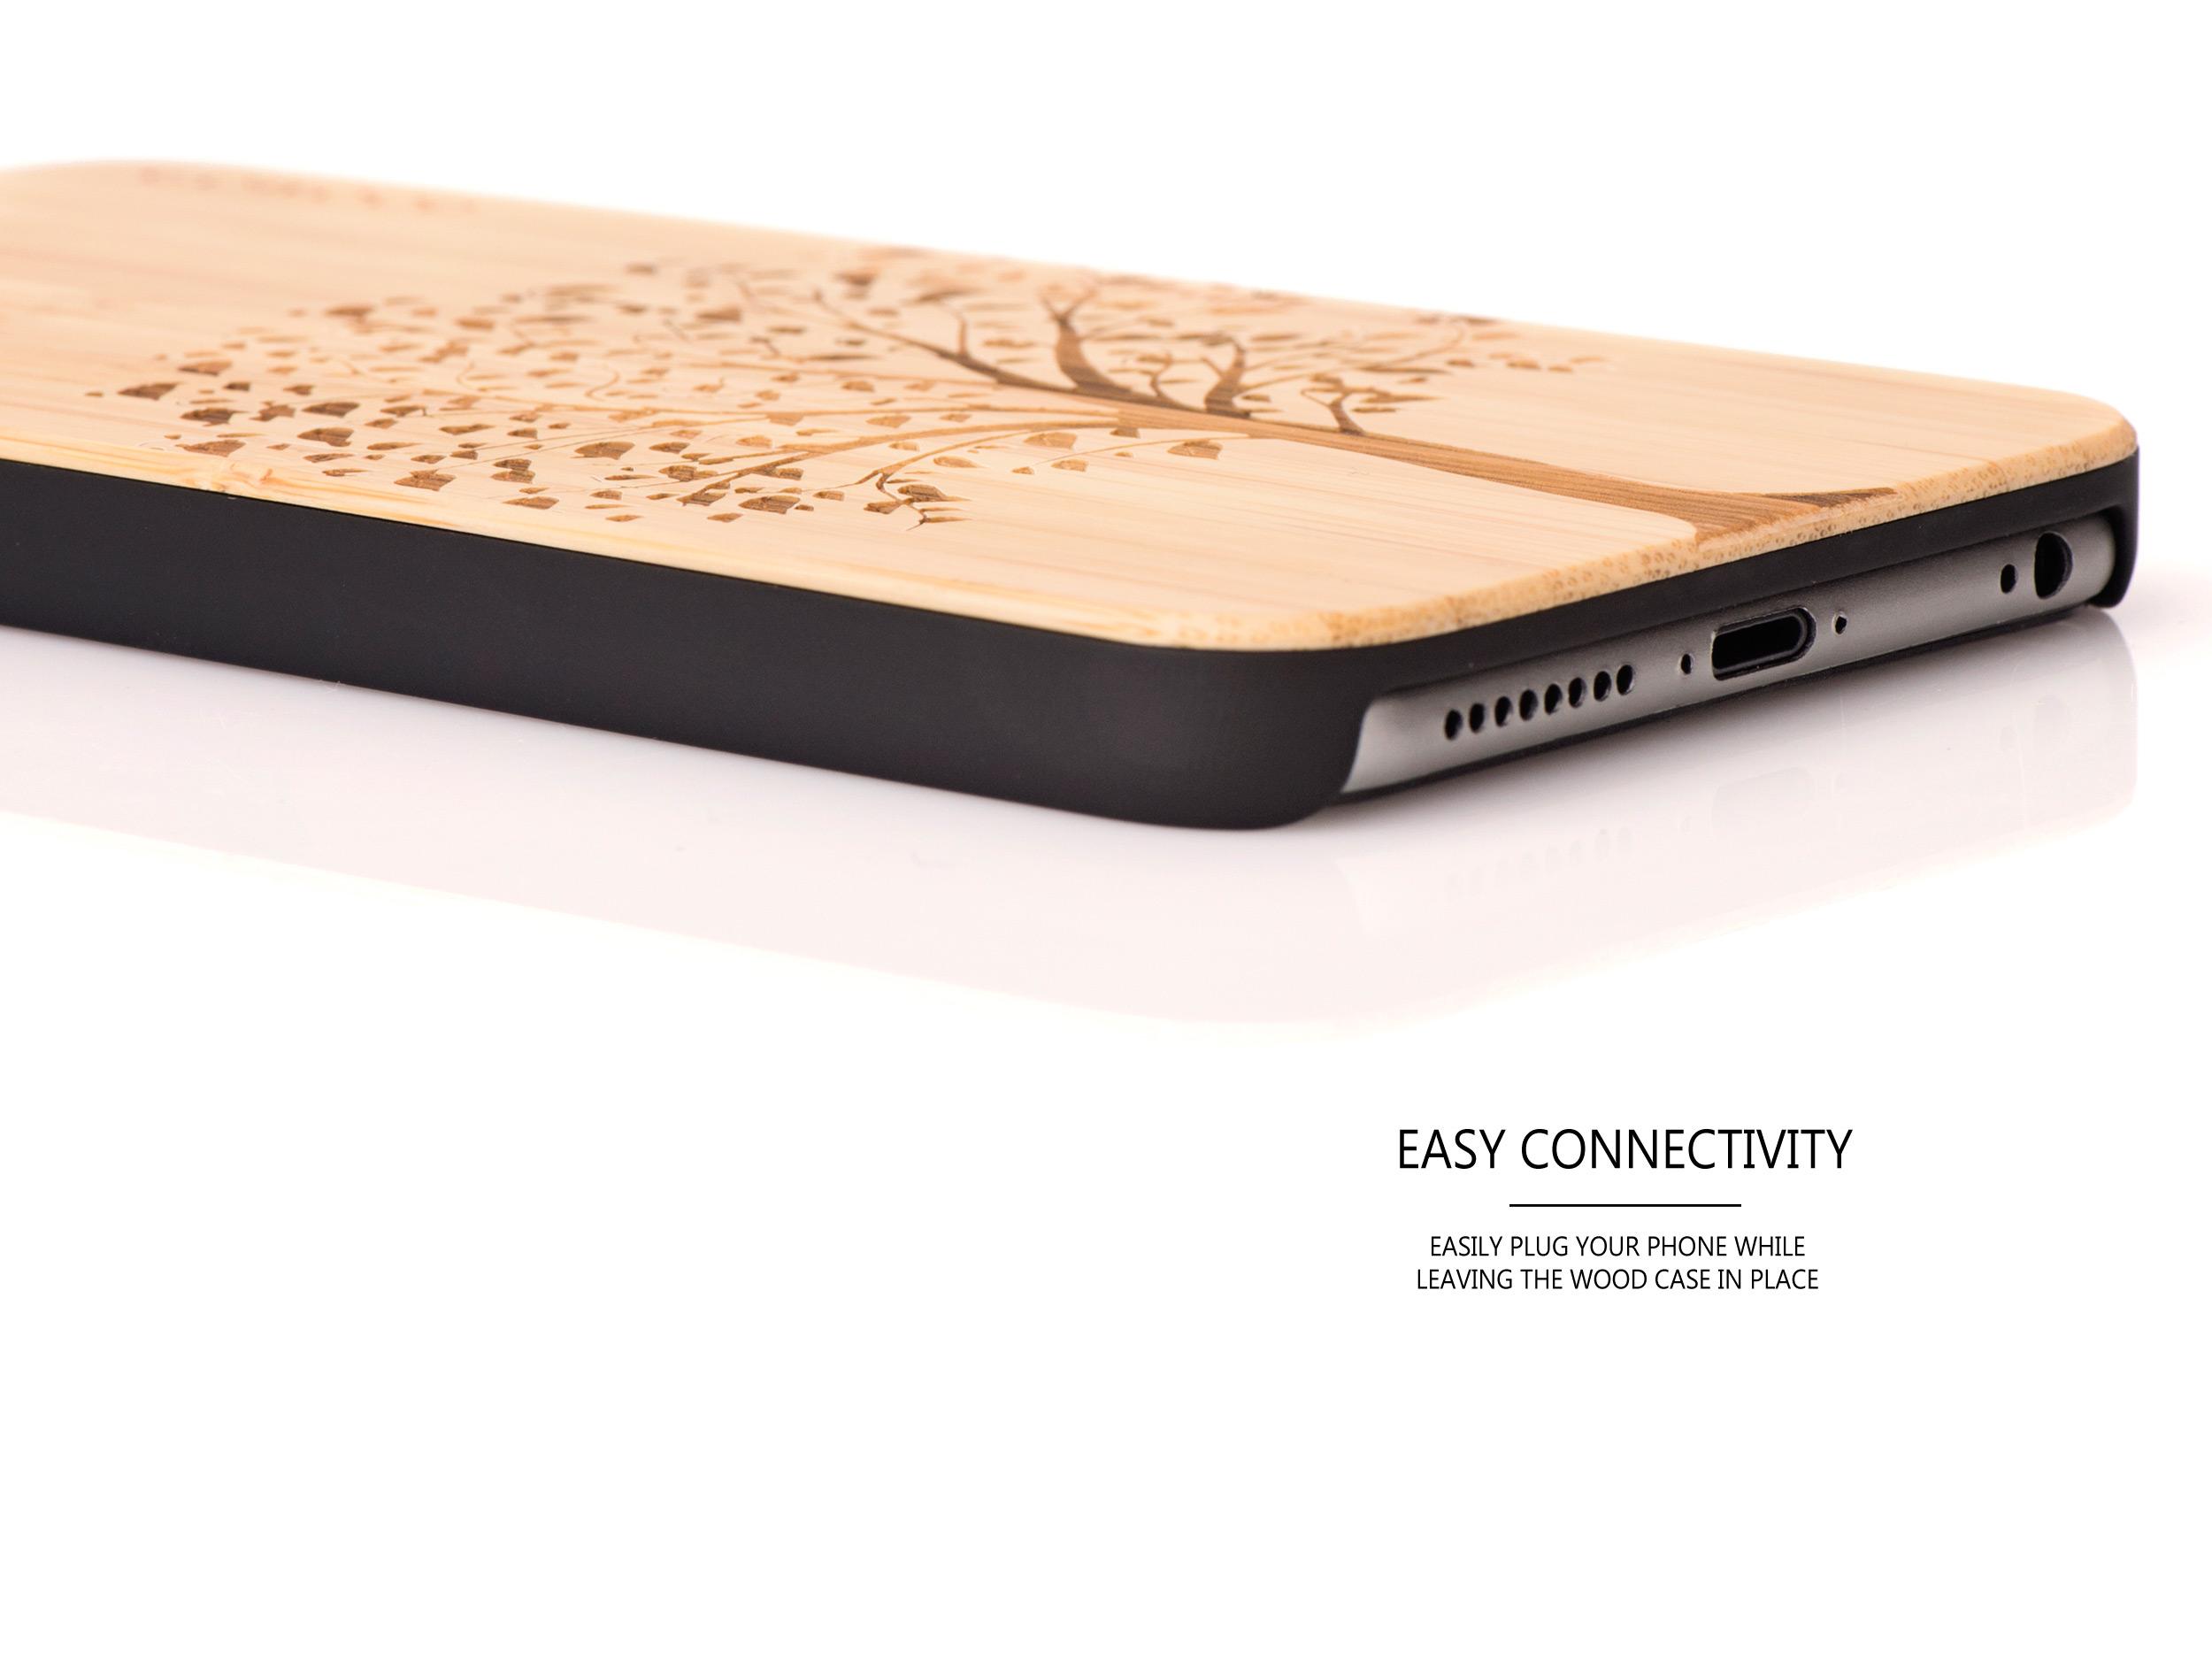 iPhone 6 Plus wood case tree connectivity